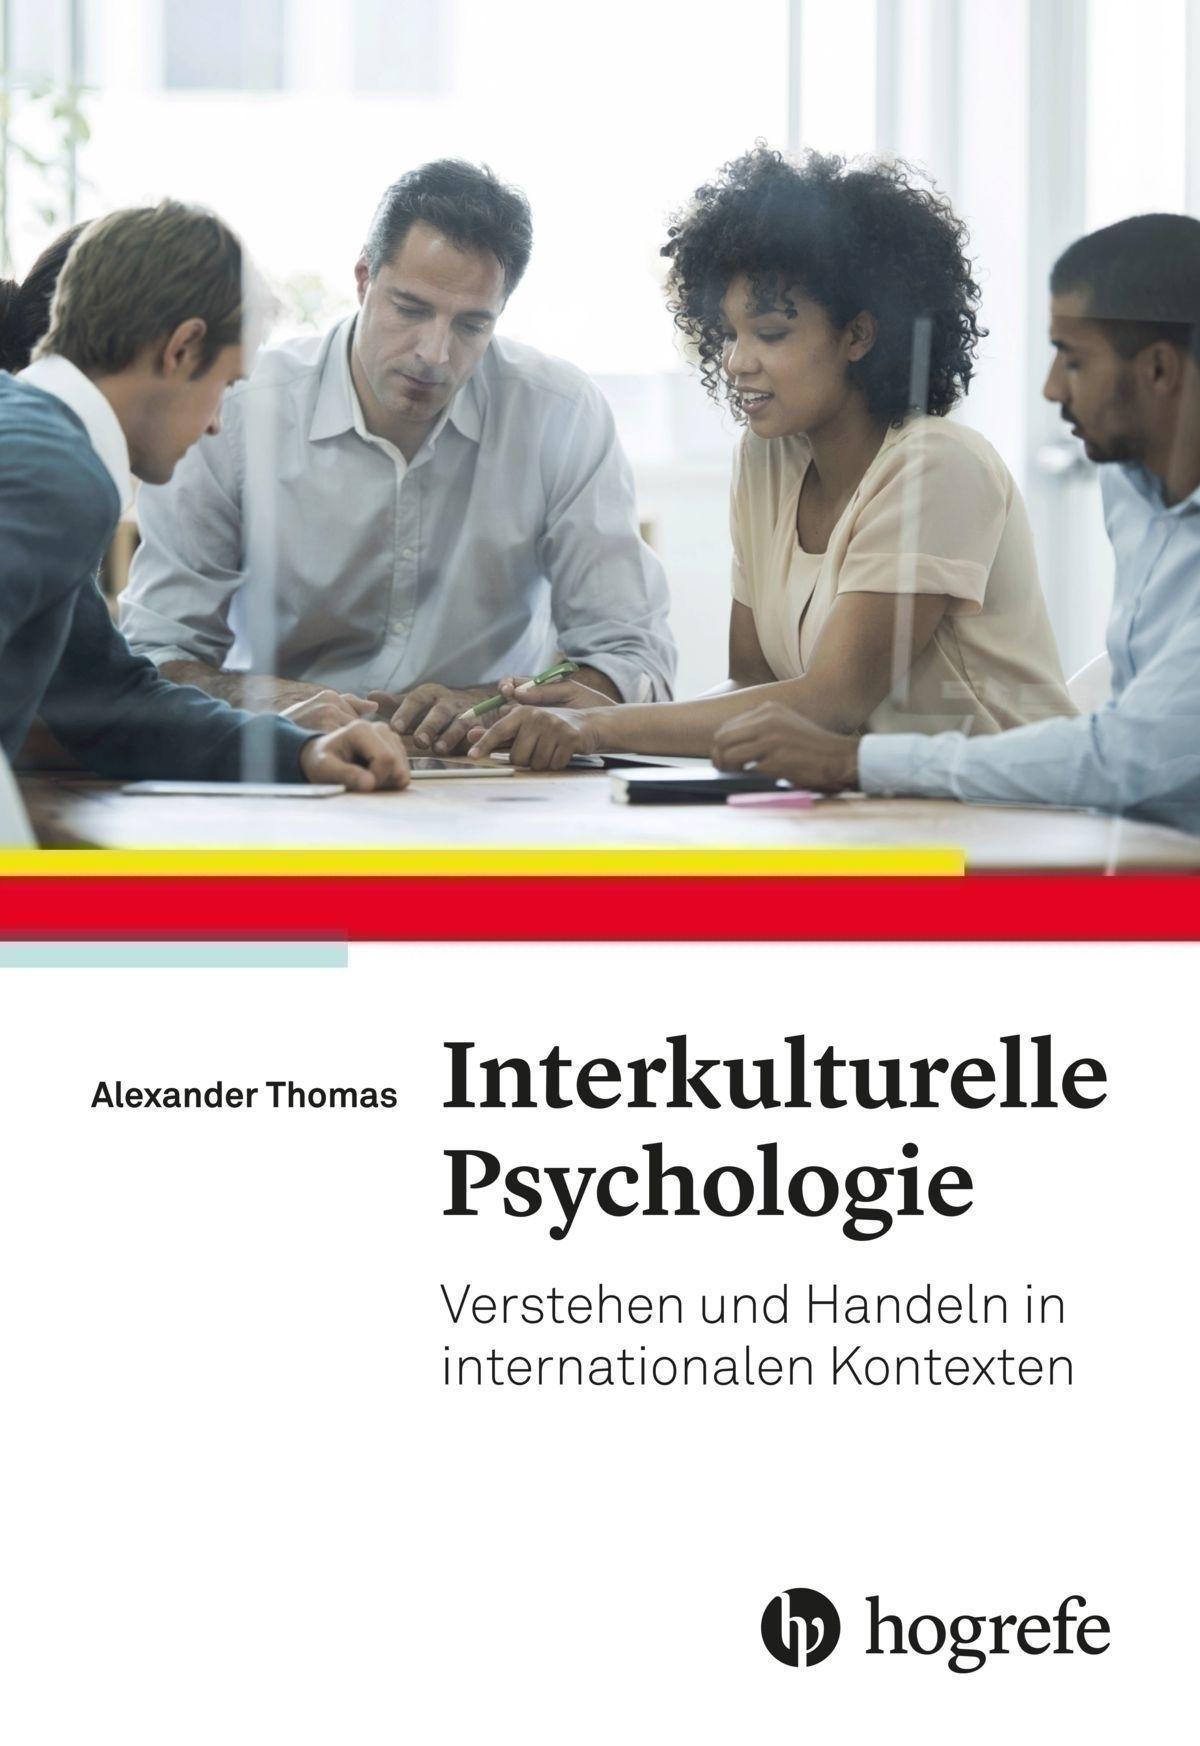 Interkulturelle Psychologie